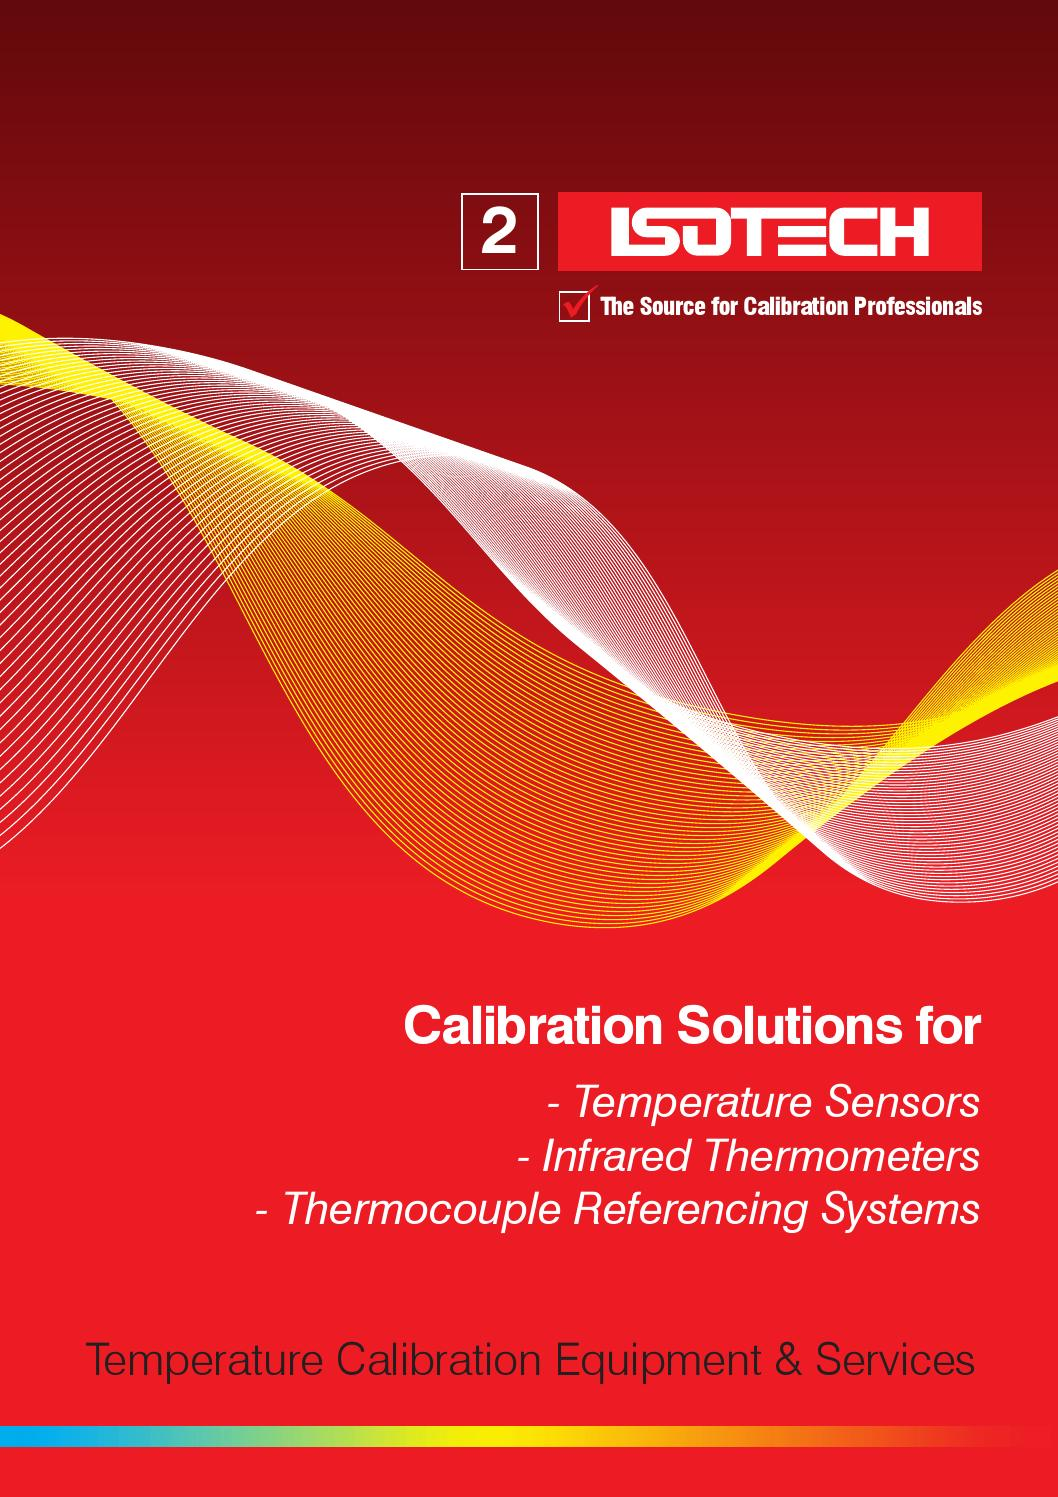 PT100 Type 215mm Probe Thermocouple Temperature Measurement Sensors